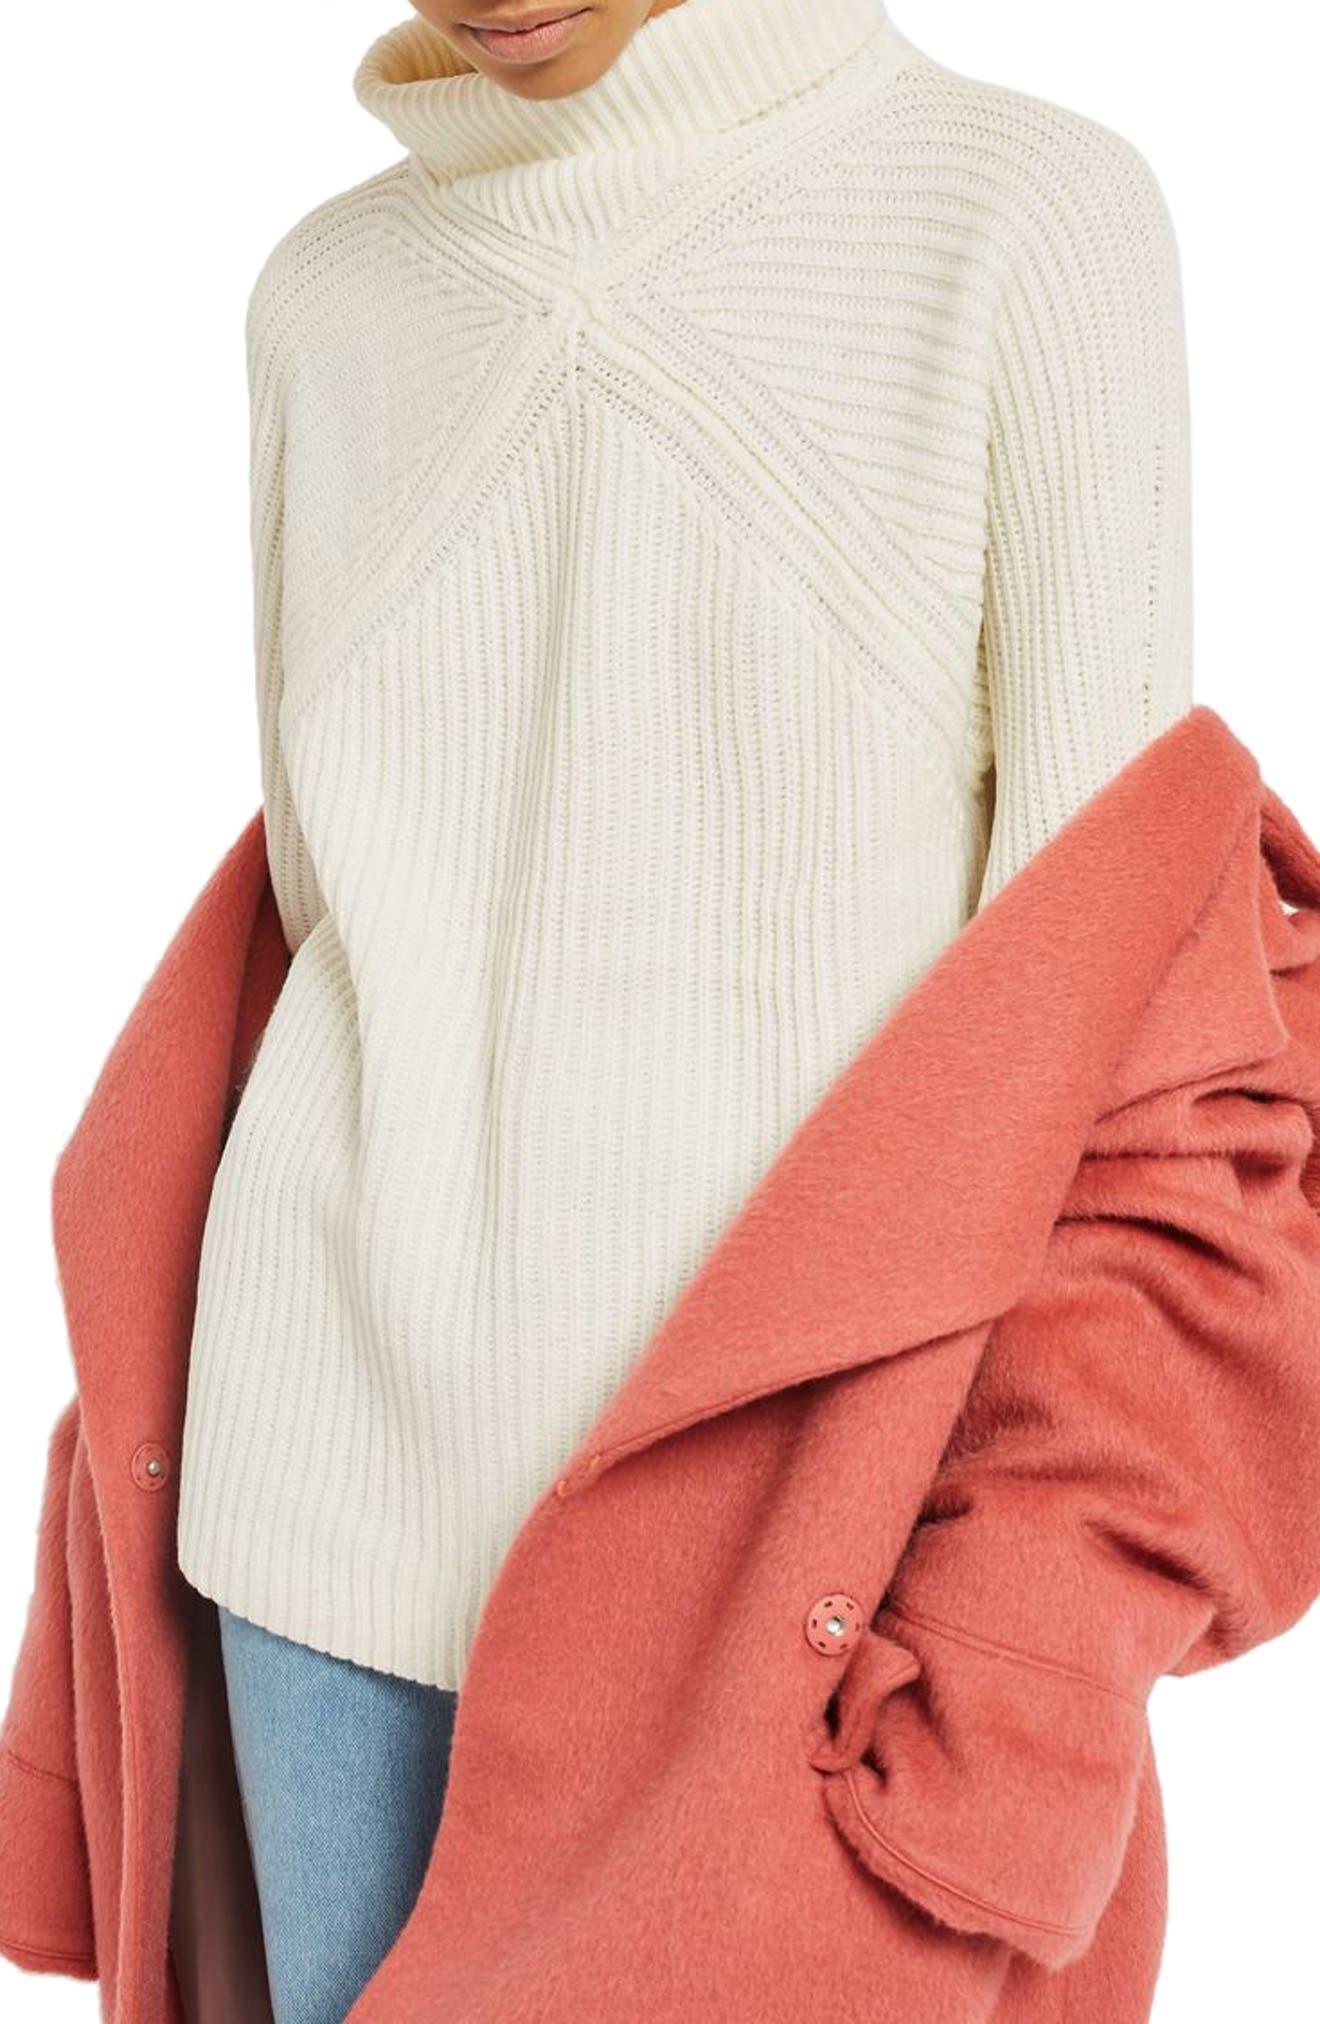 Diamond Stitch Turtleneck Sweater,                             Main thumbnail 1, color,                             900